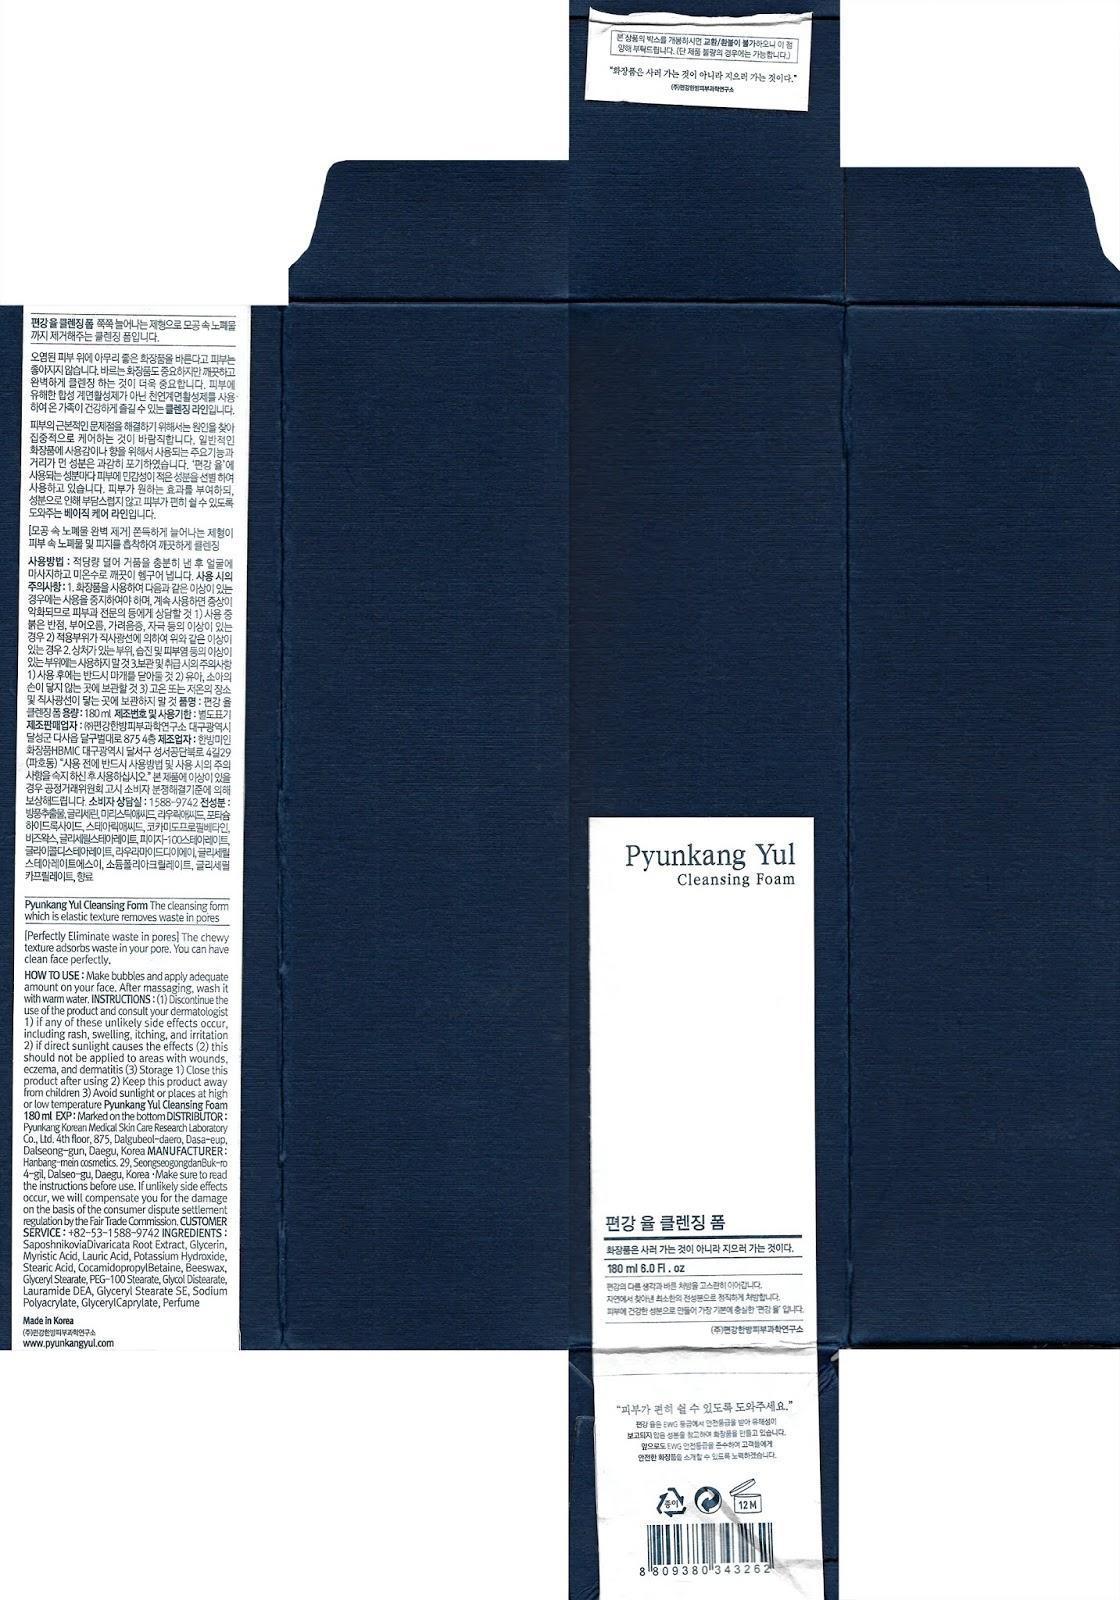 lavlilacs Pyunkang Yul Cleansing Foam packaging